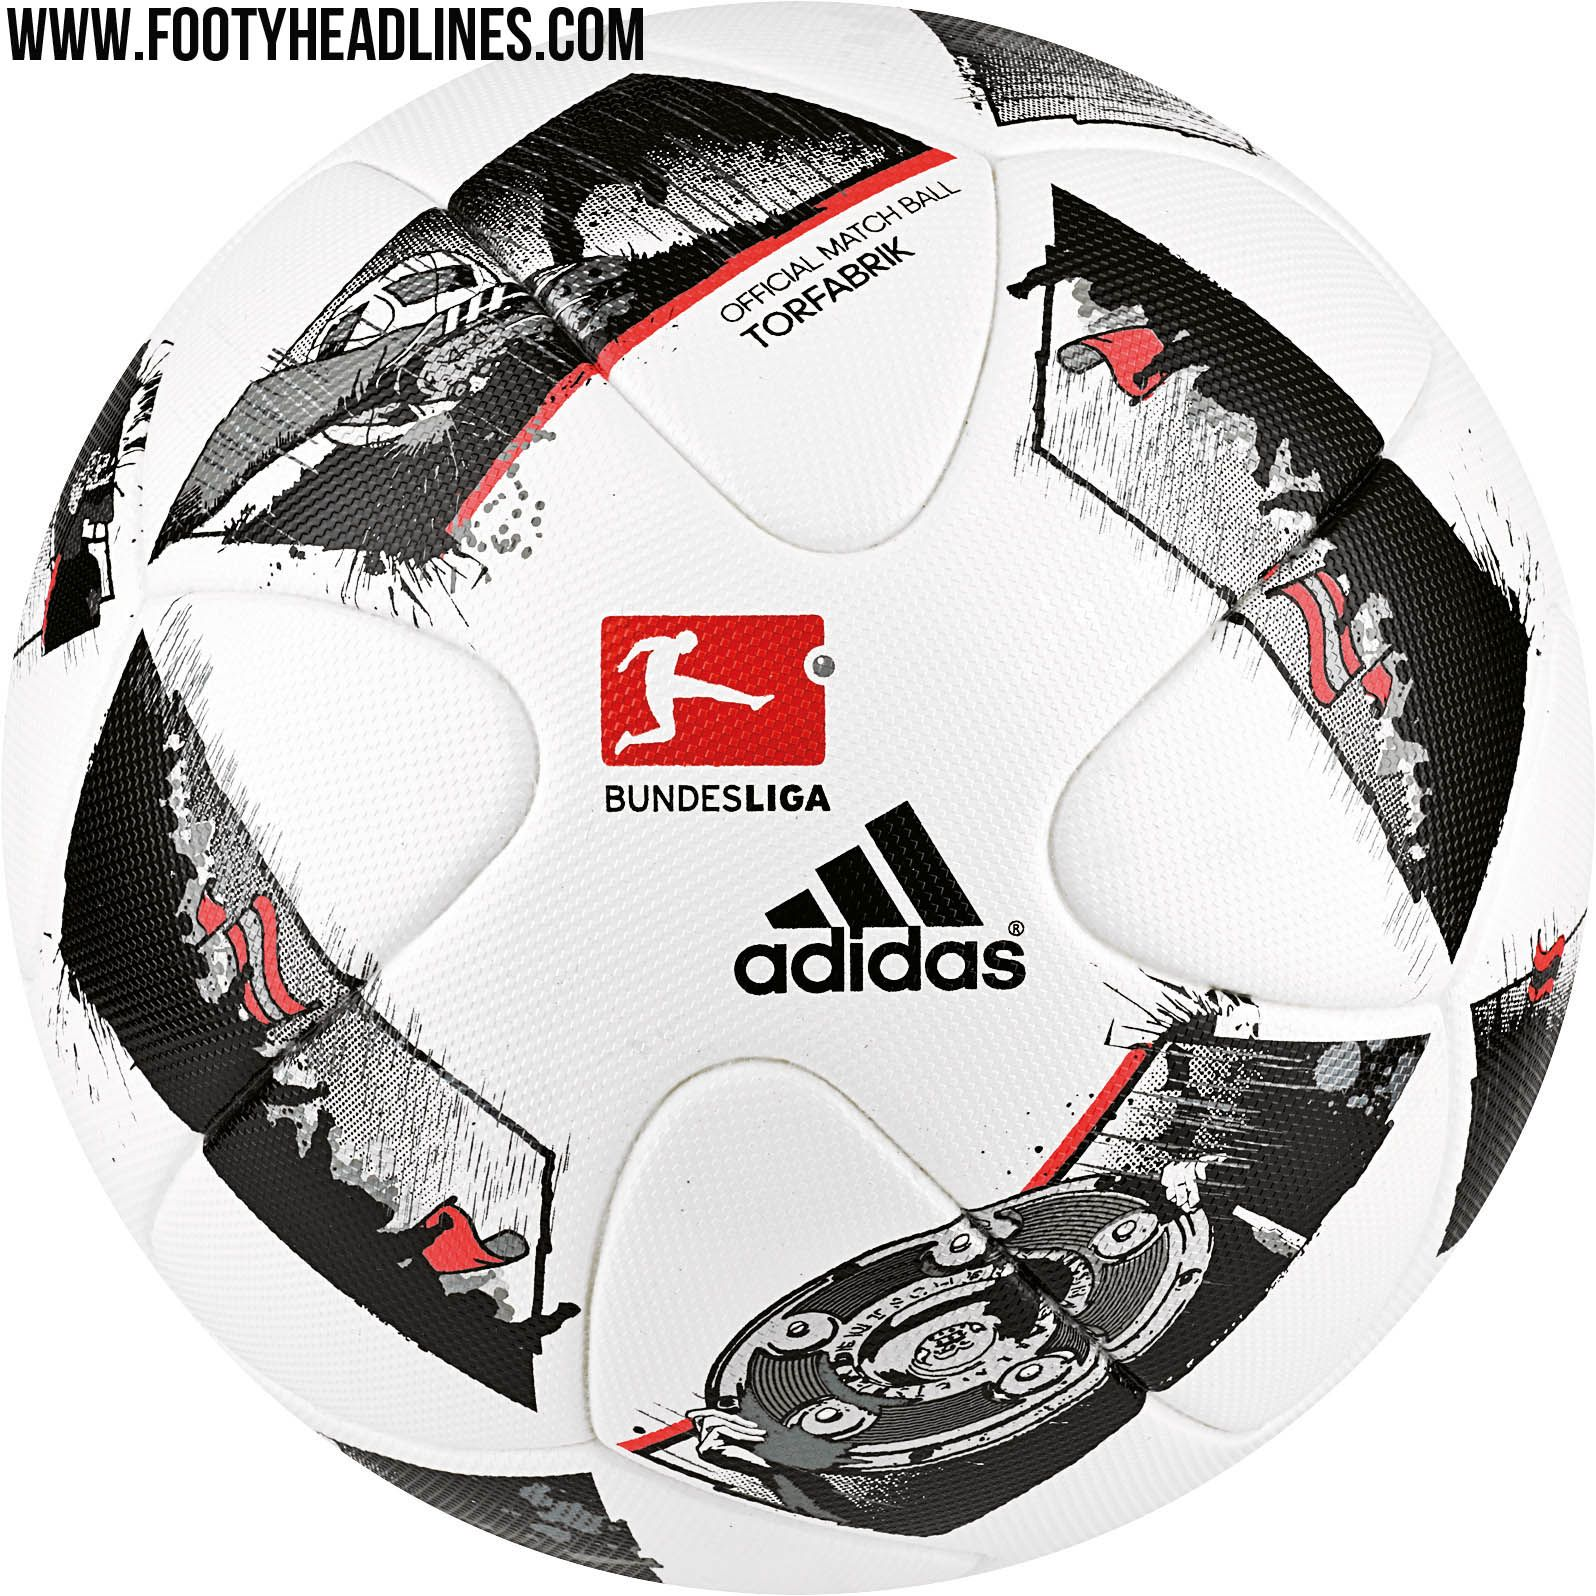 Adidas 16-17 Bundesliga Ball Leaked - Footy Headlines  9a5cc6d5db706